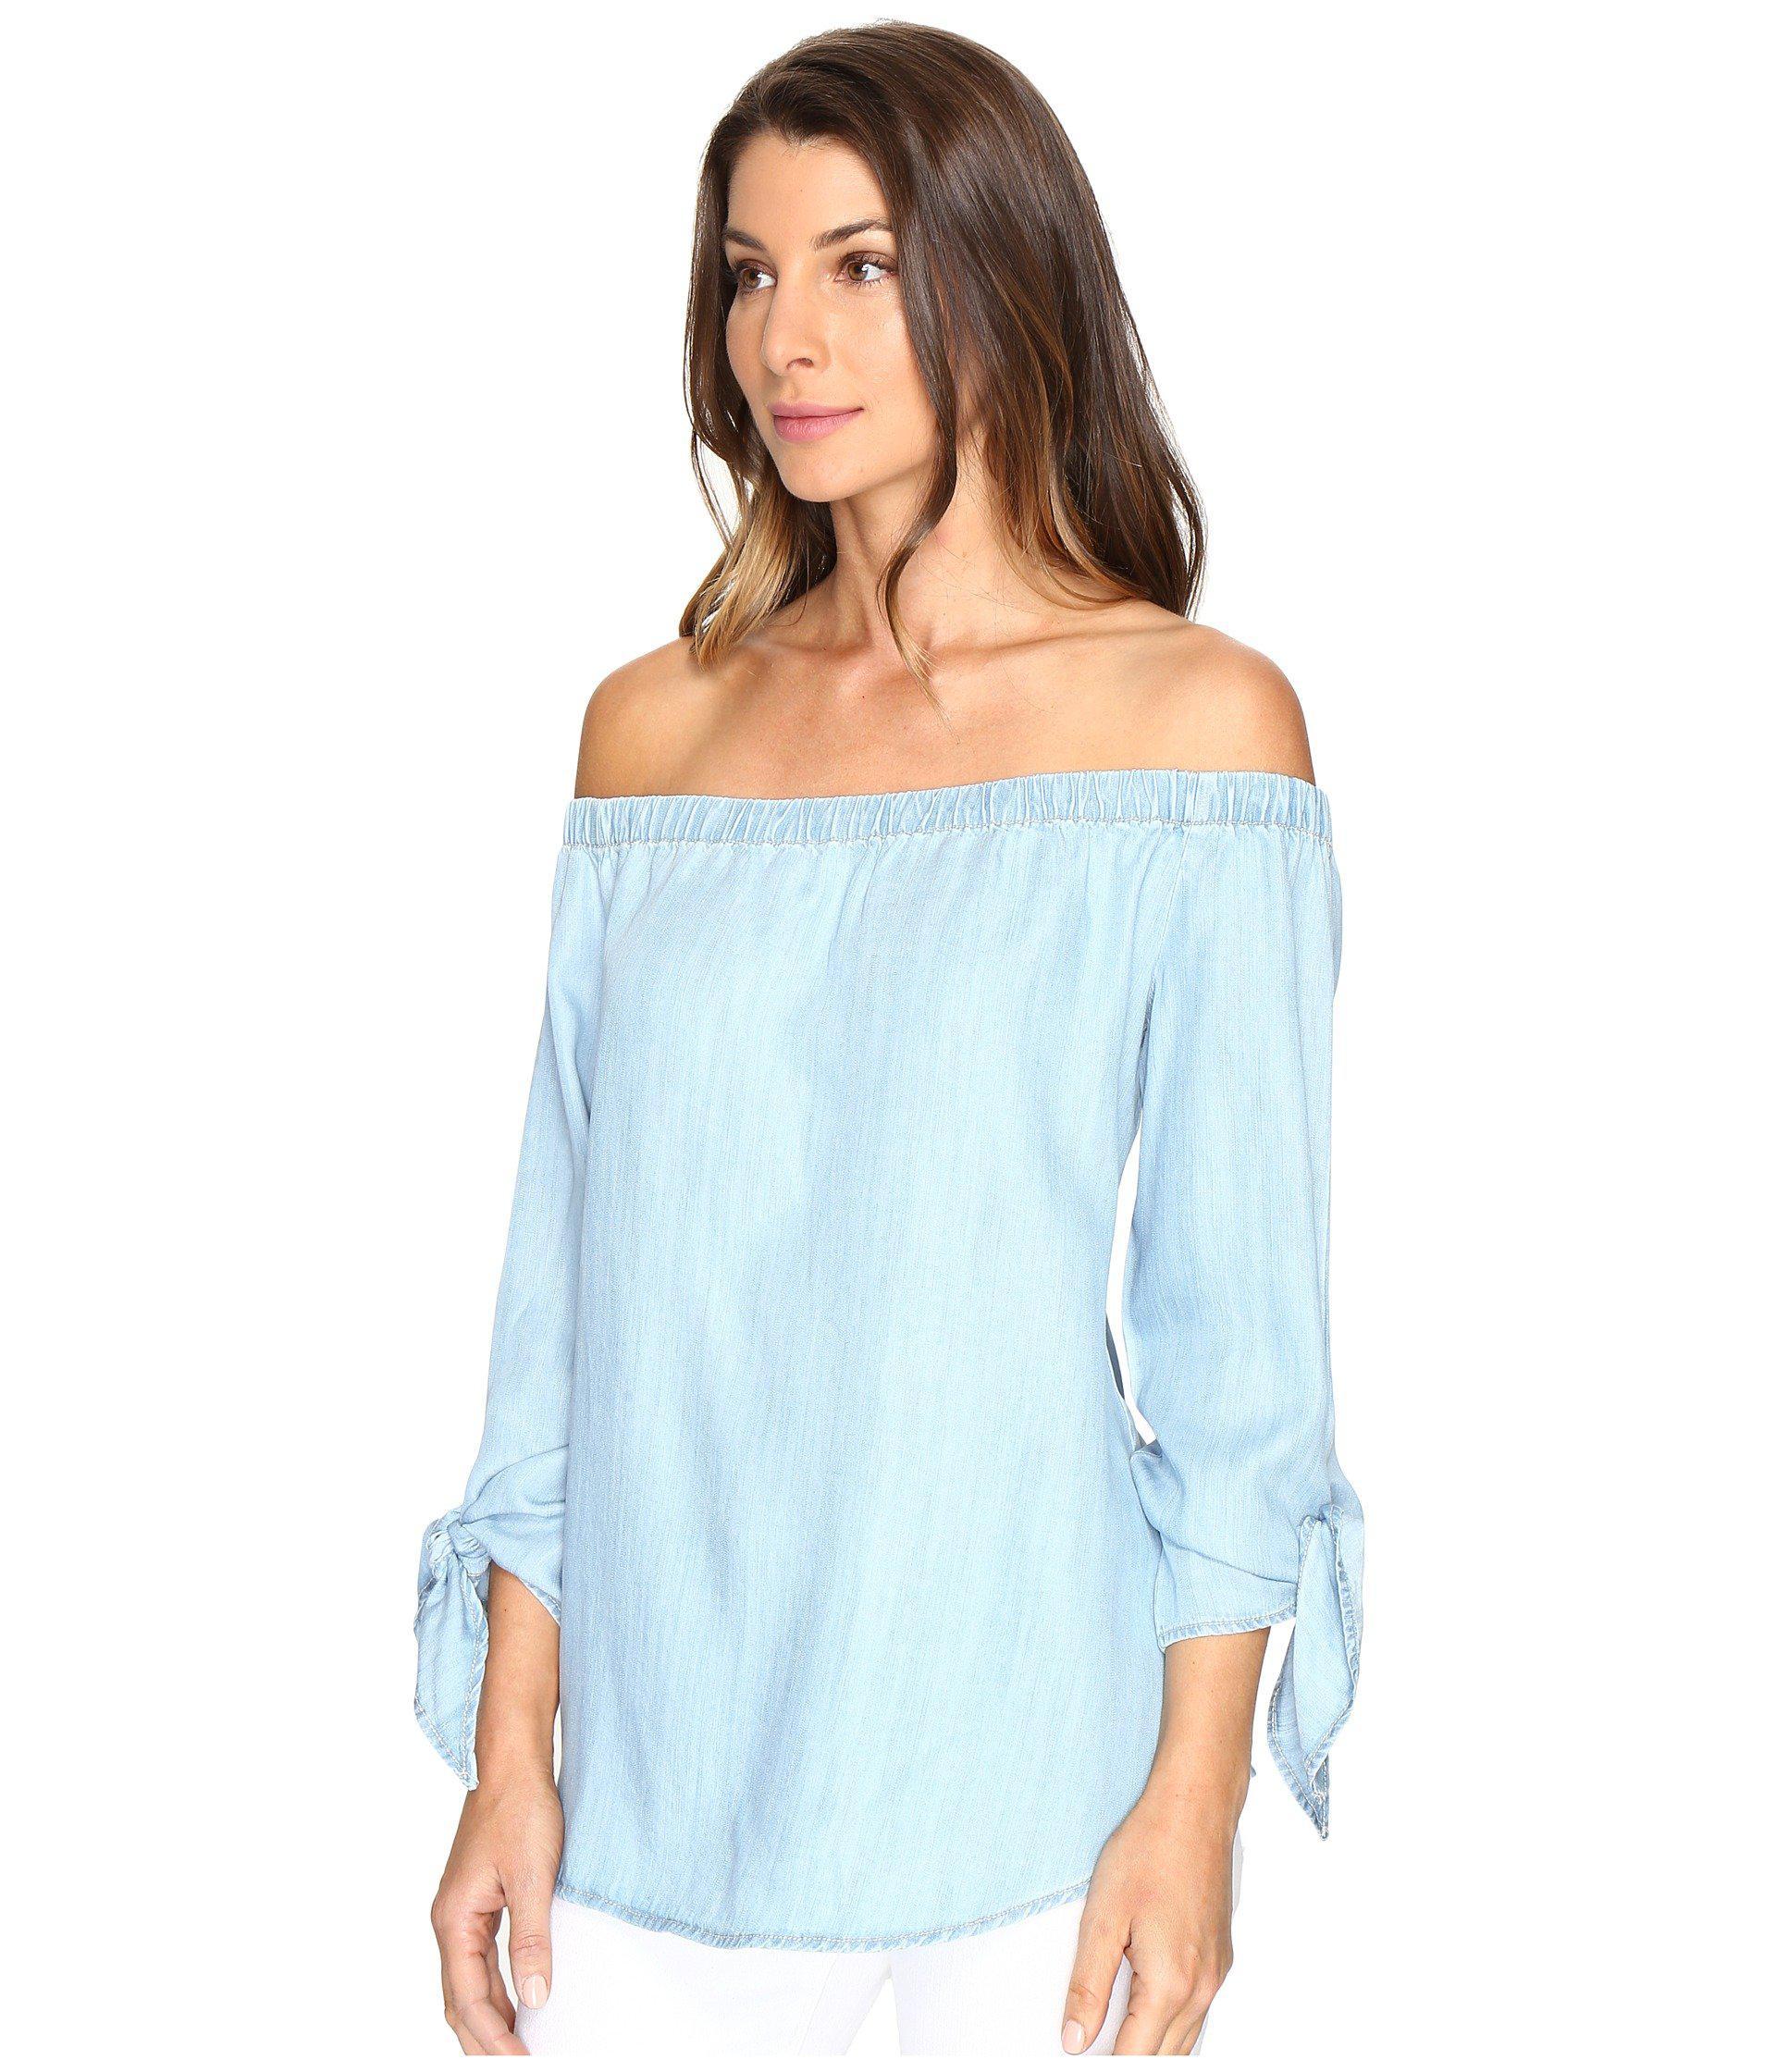 b0fd5761d492d7 Lyst - Karen Kane Tie-sleeve Off The Shoulder Top in Blue - Save 35%